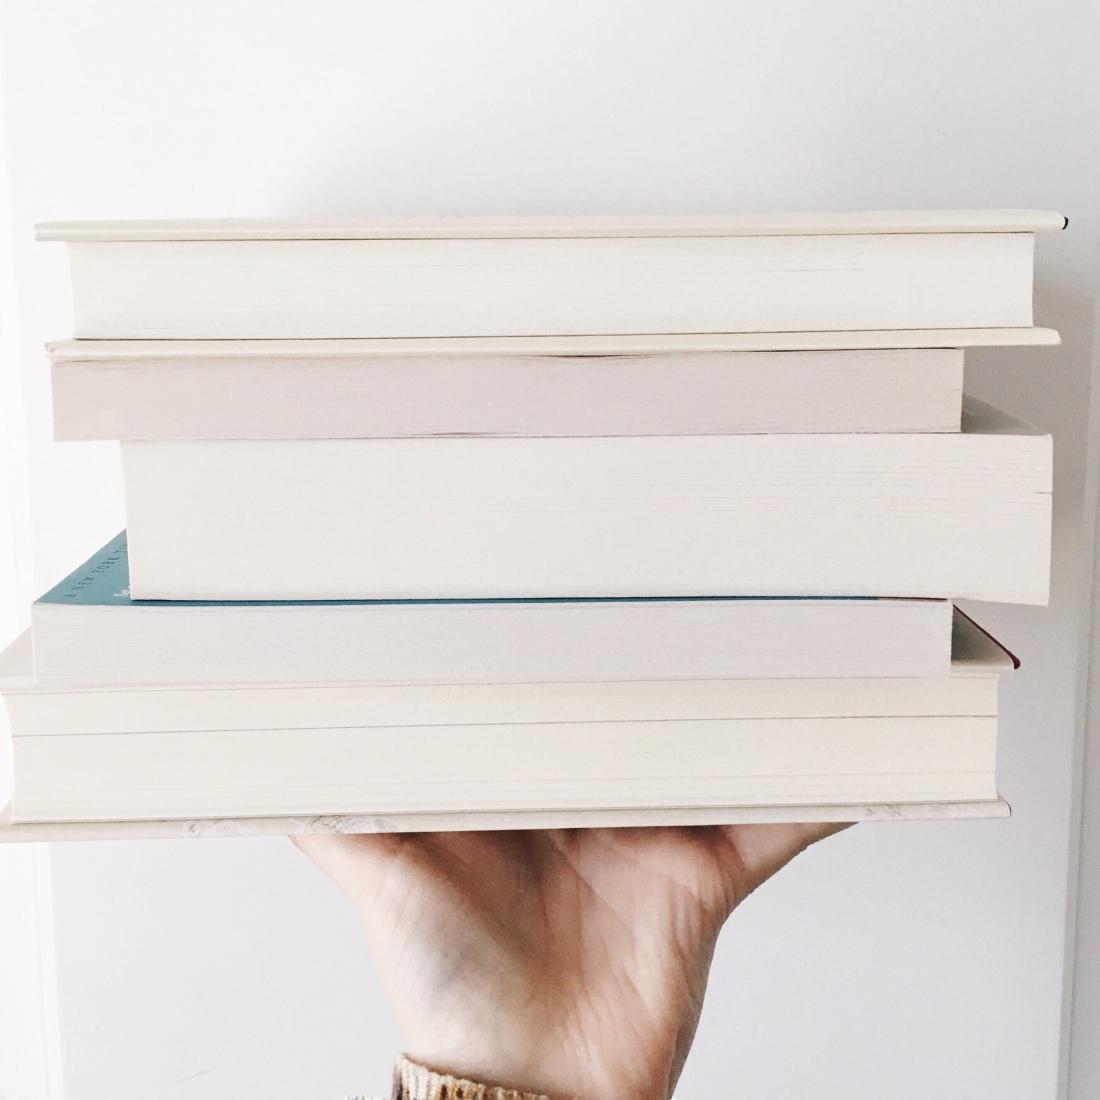 10 BOOKS I NEED TO BUY